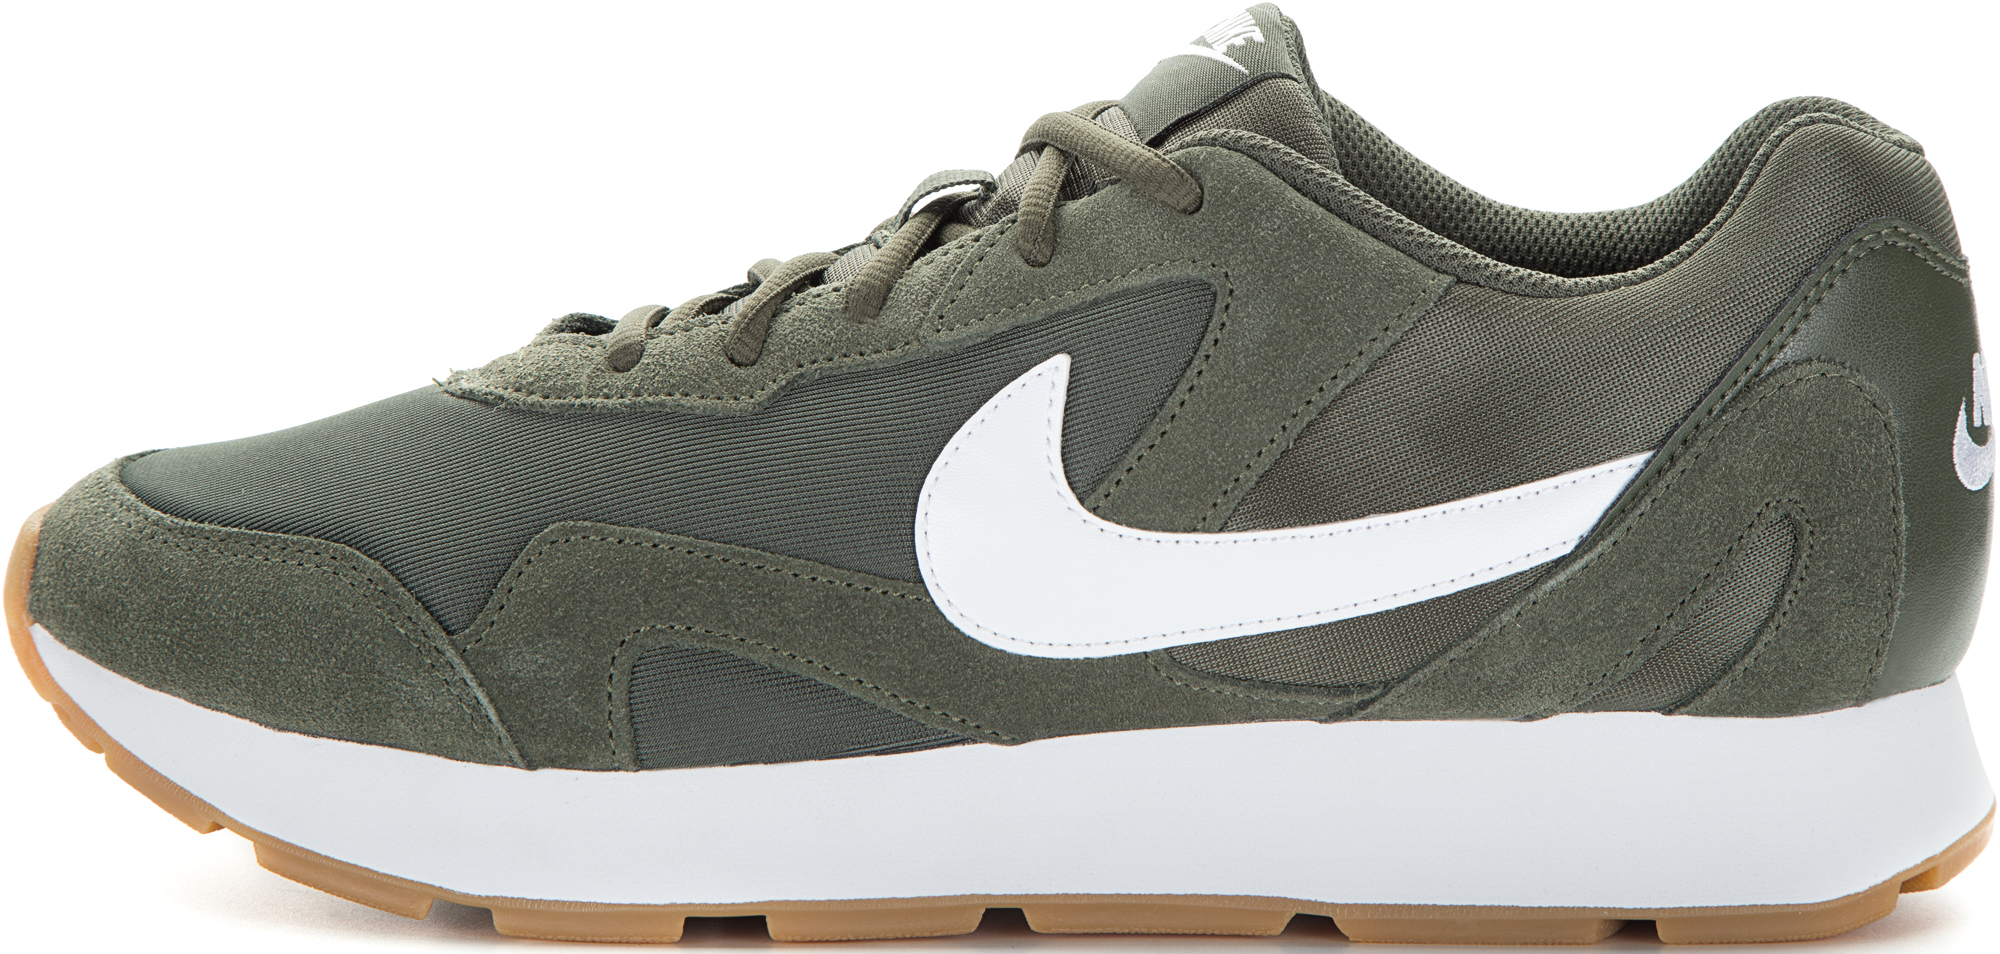 Nike Кроссовки мужские Delfine, размер 42